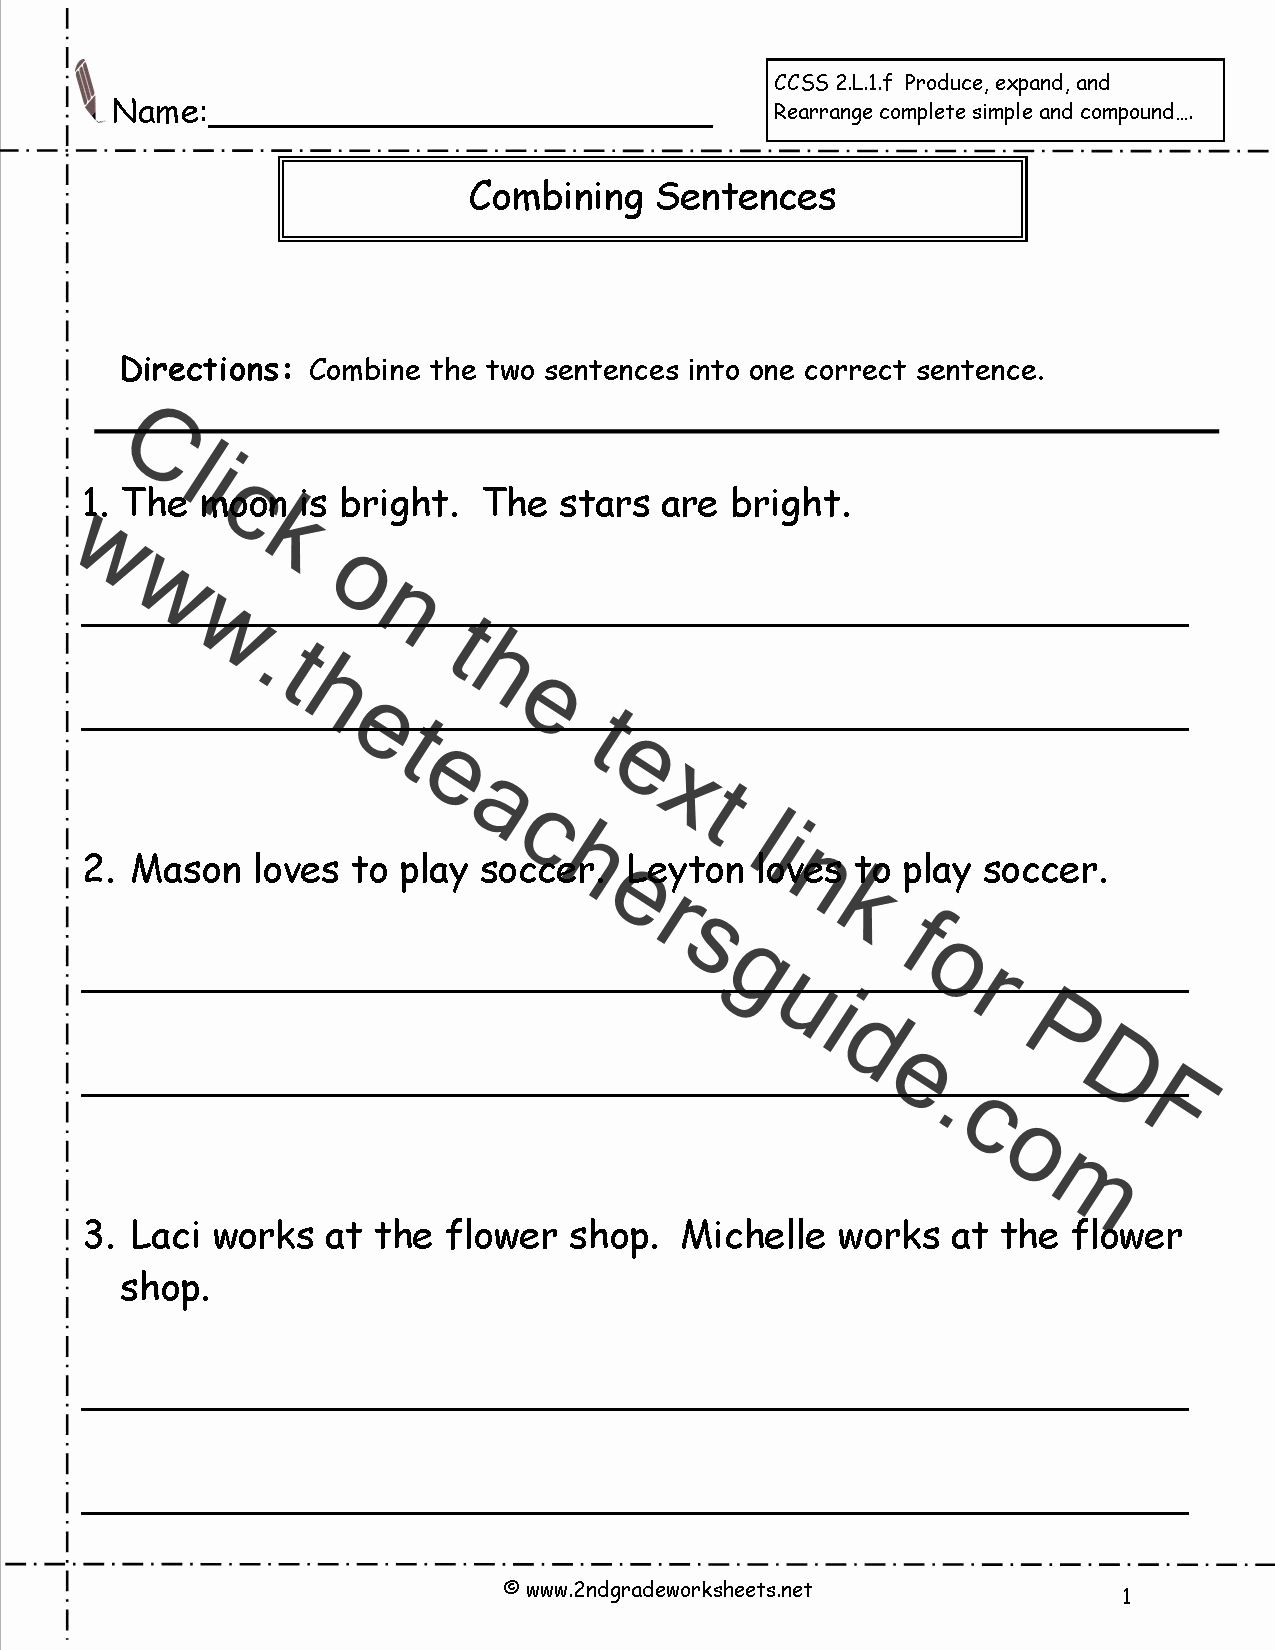 Complex Sentence Worksheets 3rd Grade Fresh Pound Sentences Worksheet 3rd Grade Free Worksheet